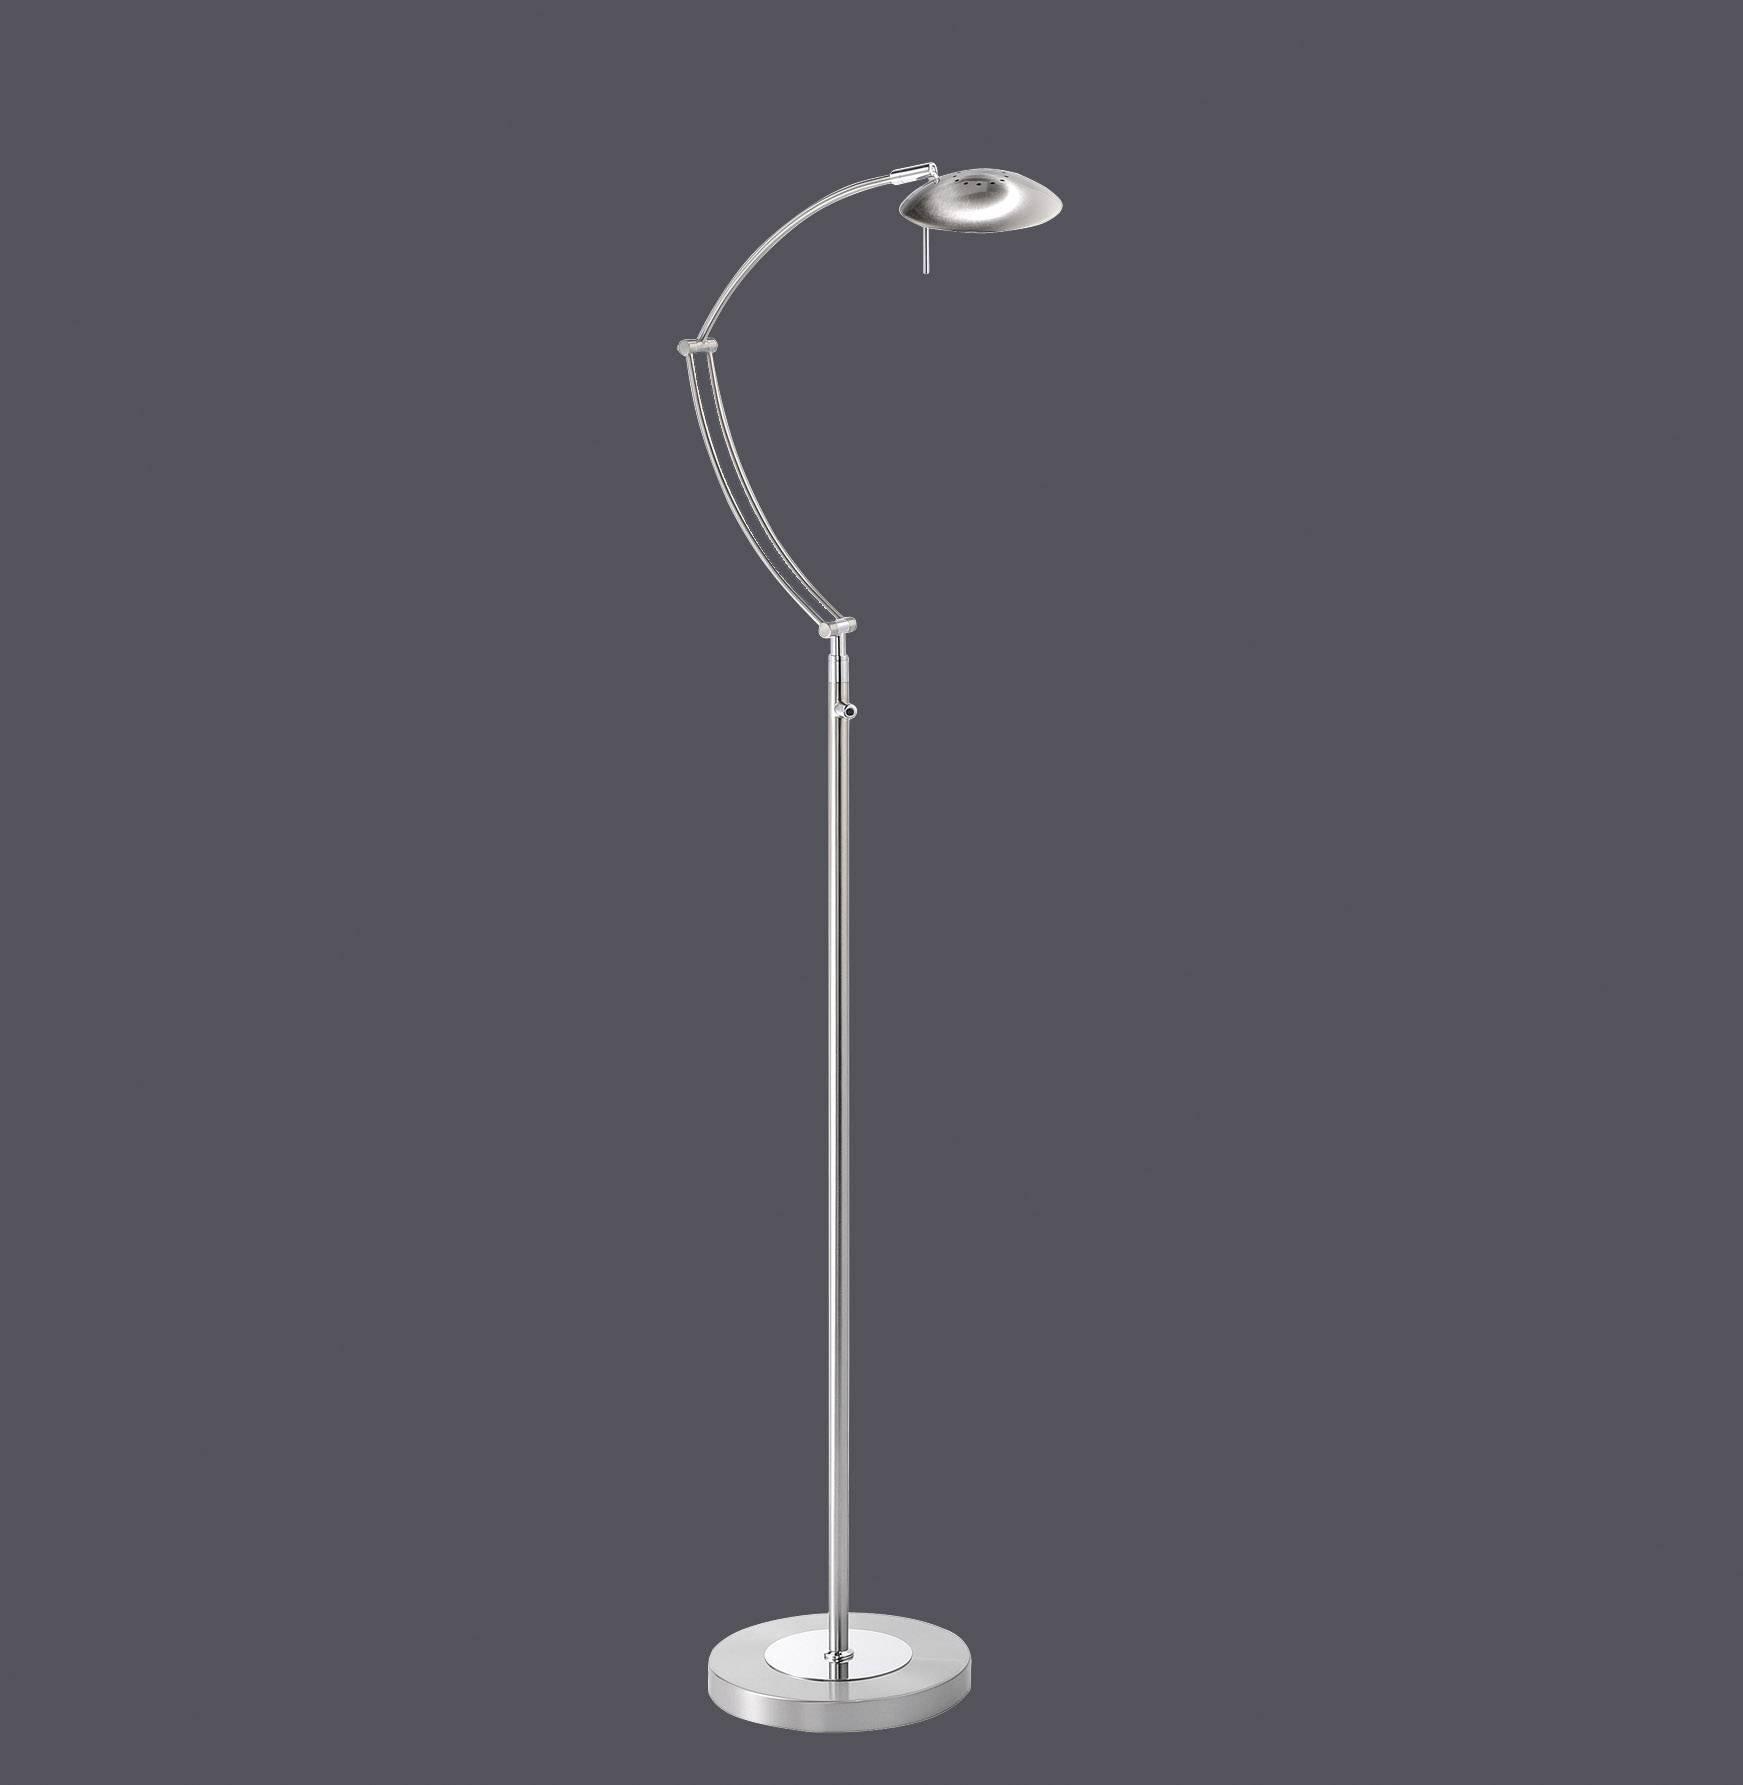 Free W Warmwei Paul Neuhaus Luxor Stahl With Stehlampe Led